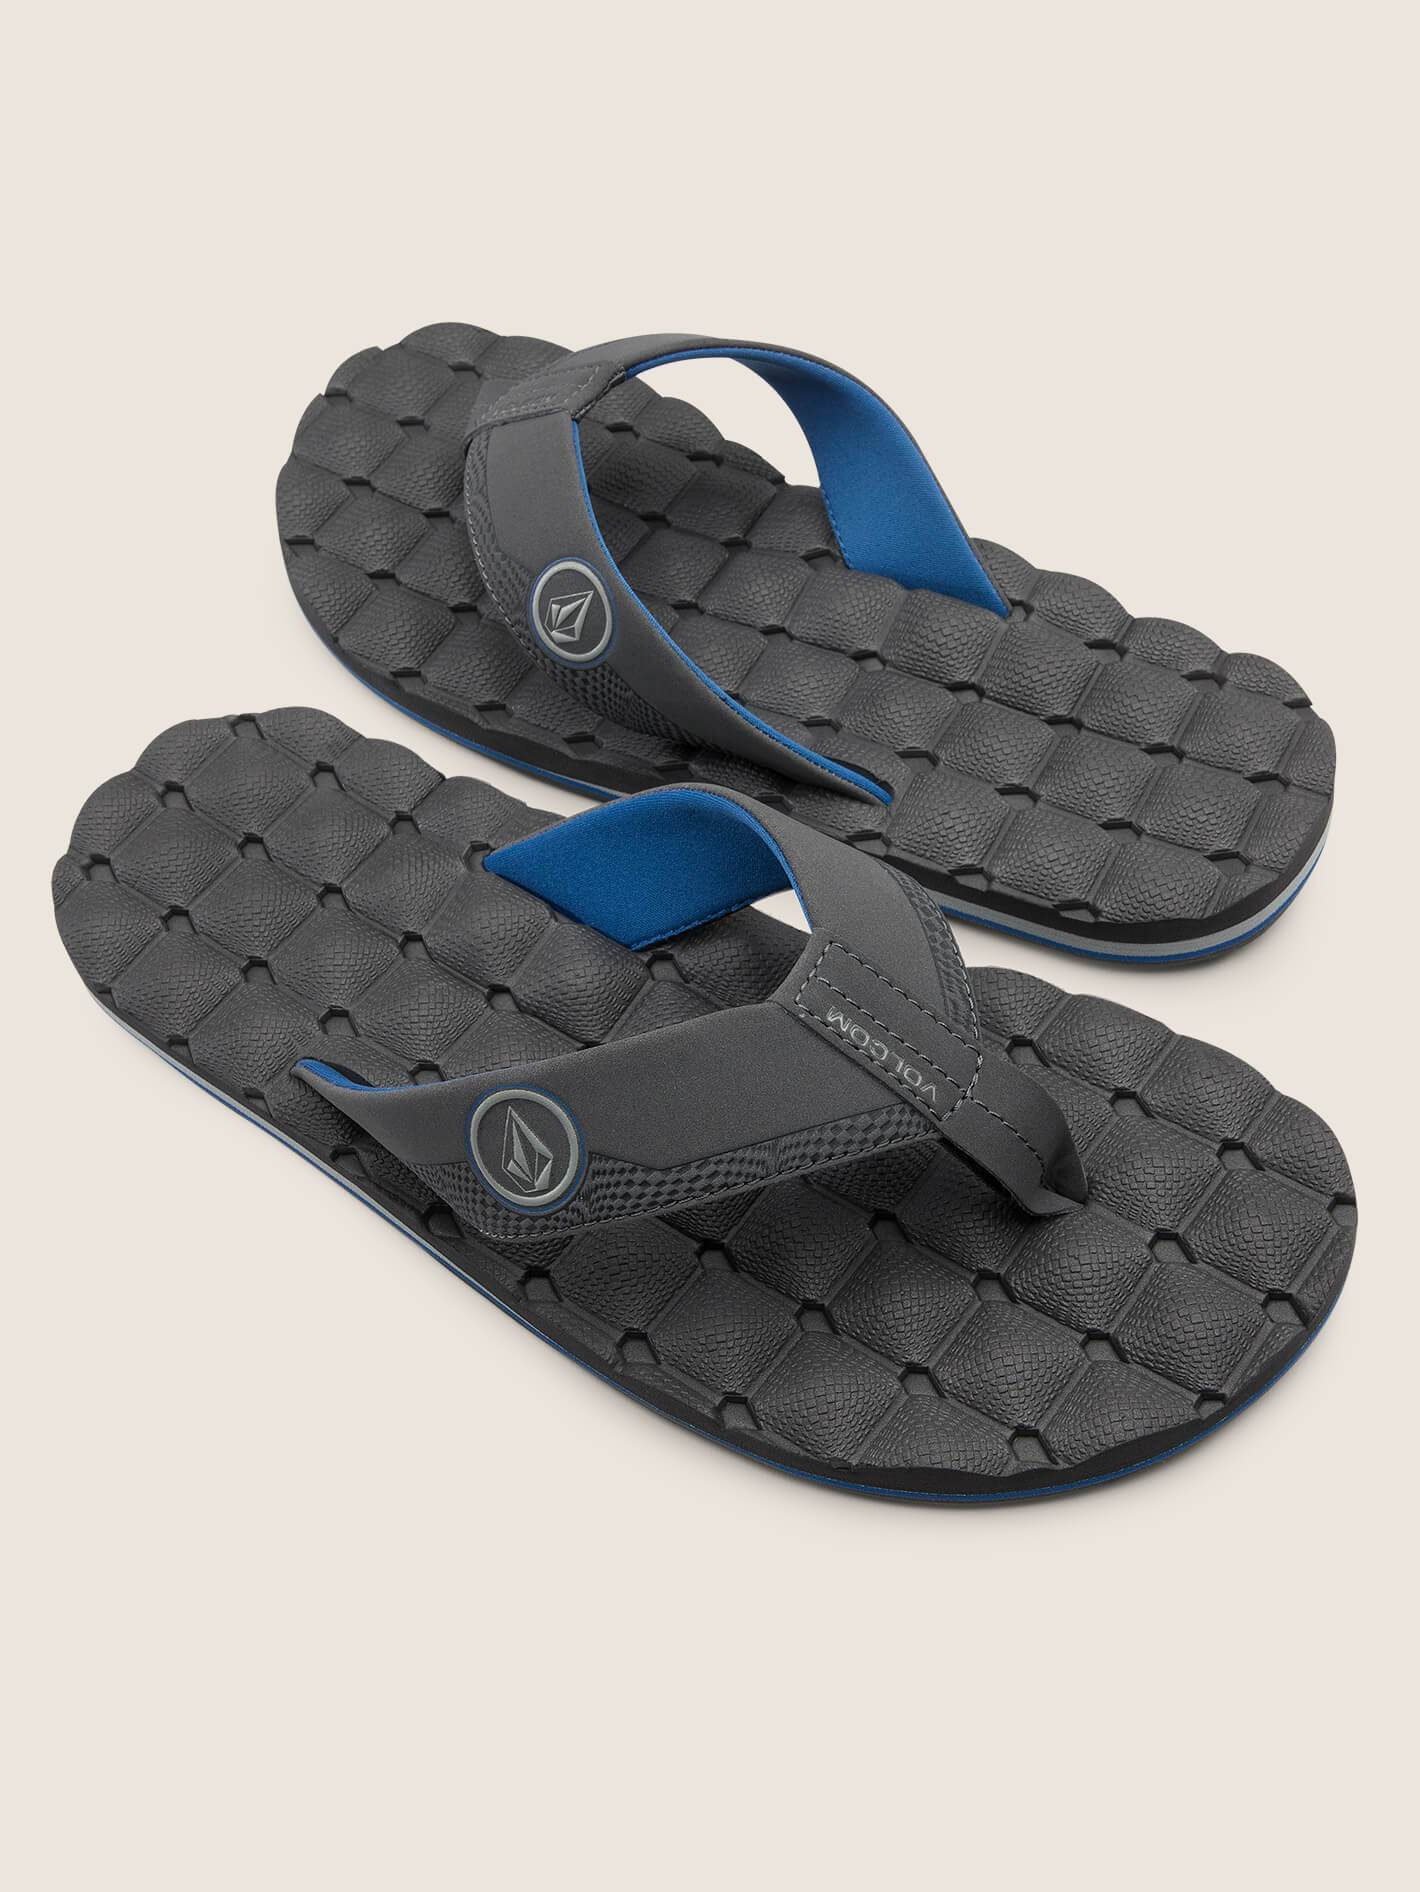 Recliner Sandals - Blue Combo - BLUE COMBO / 13